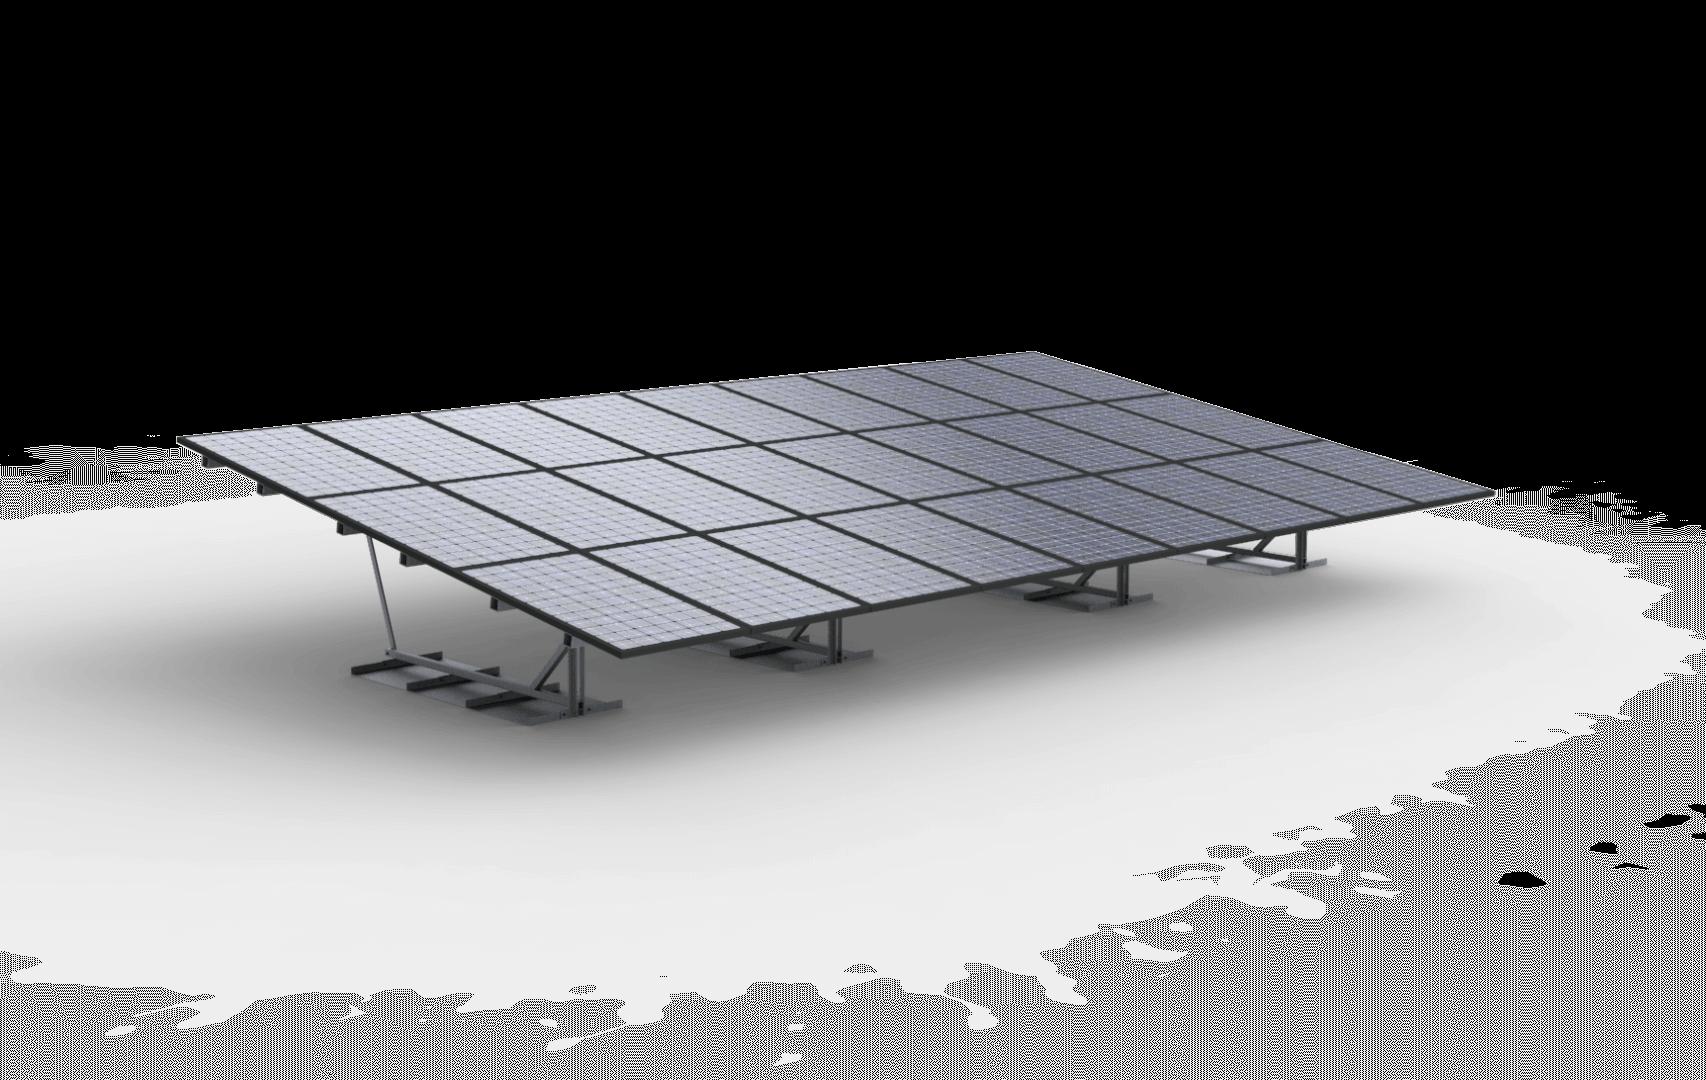 Vrije veldopstelling 27 zonnepanelen